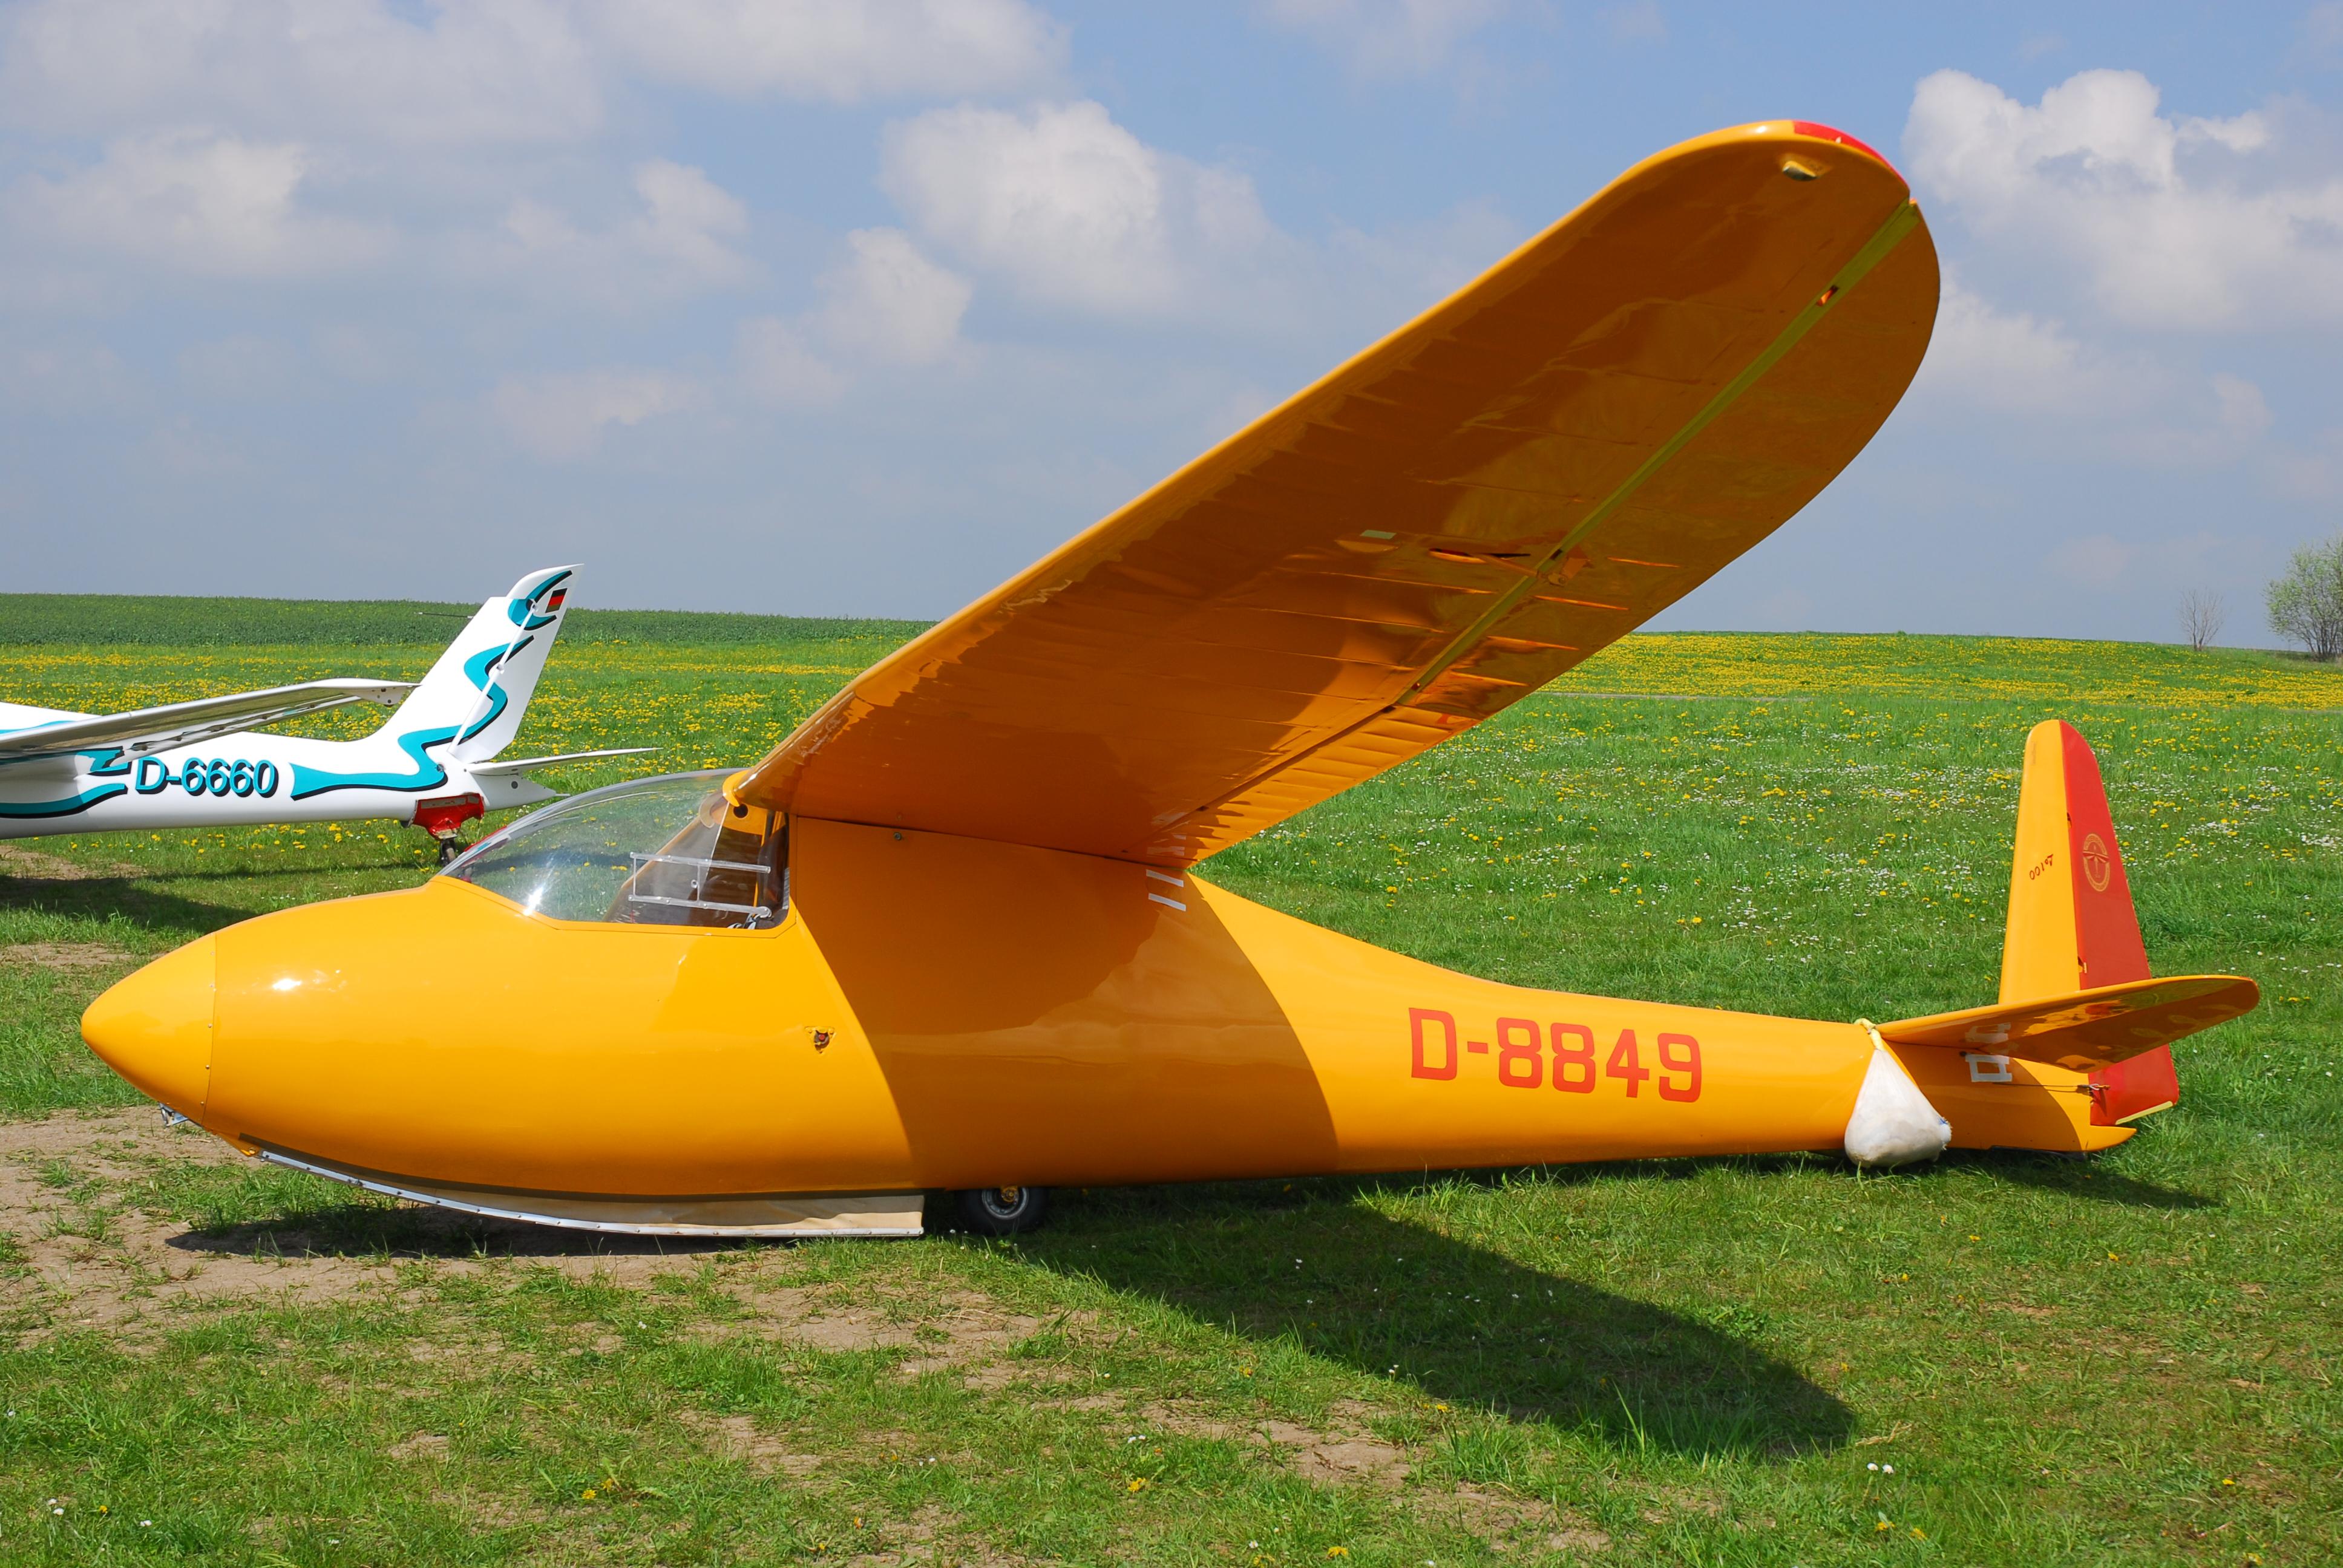 Gilb D-8849